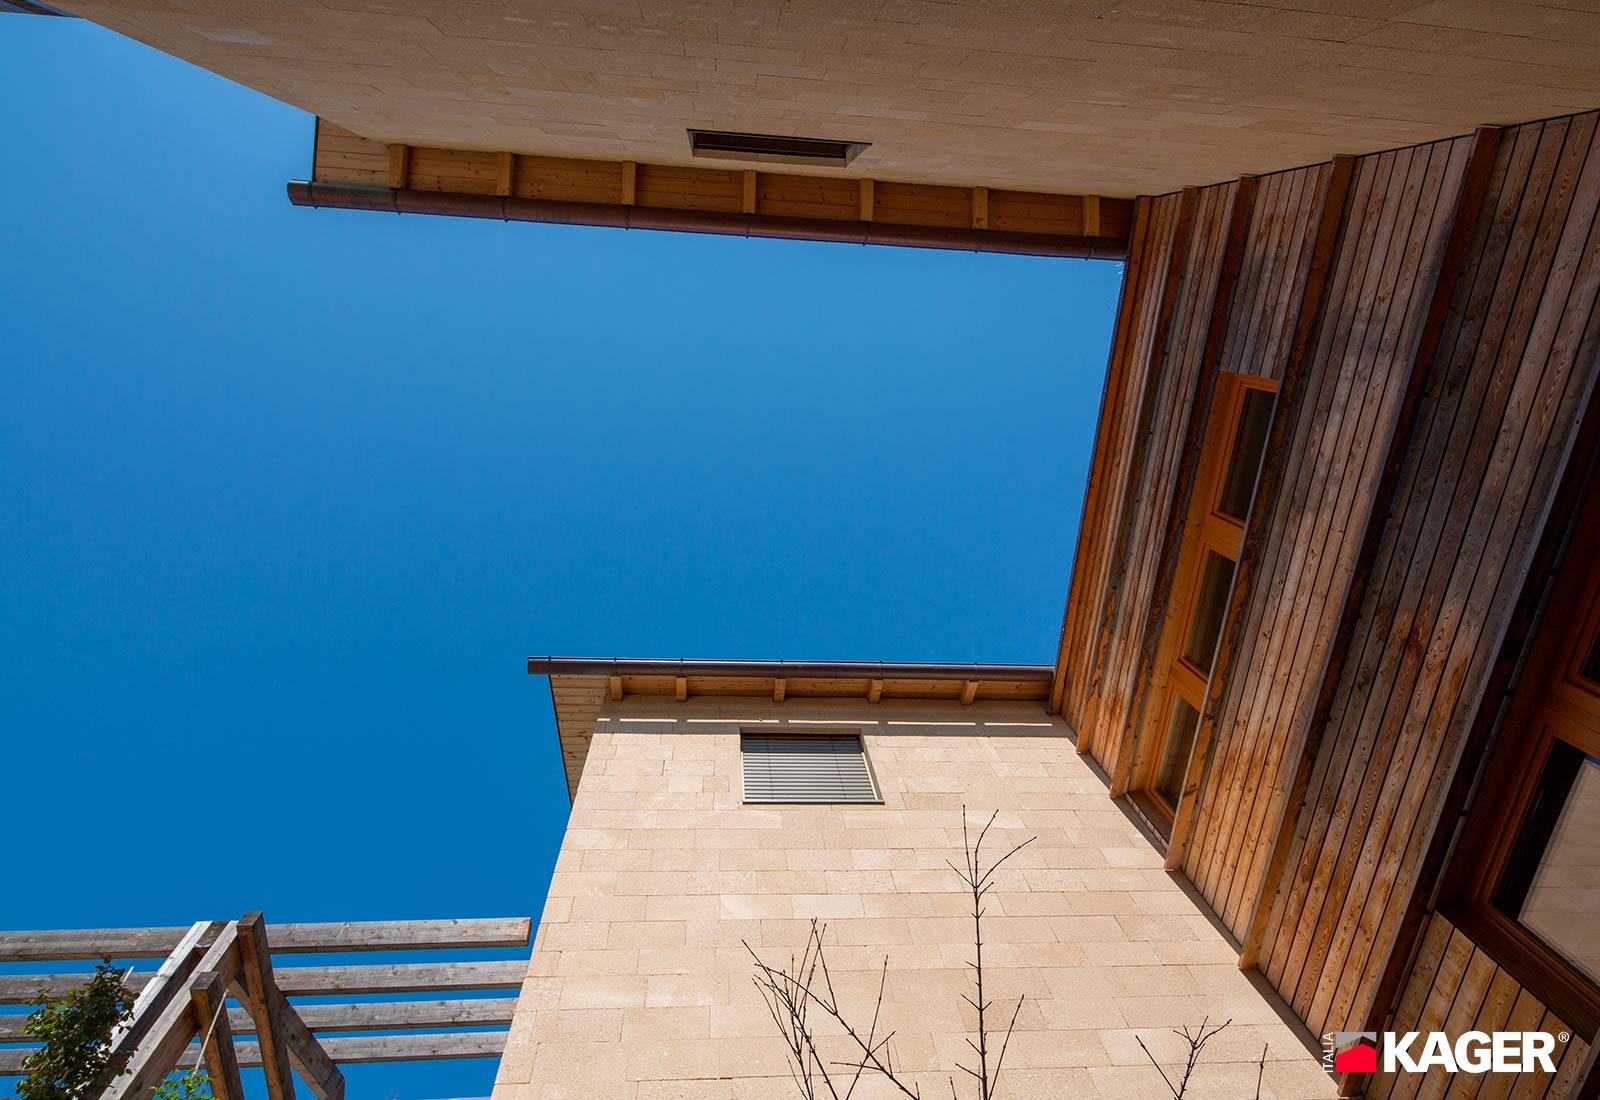 Casa-in-legno-Forli-Kager-Italia-12